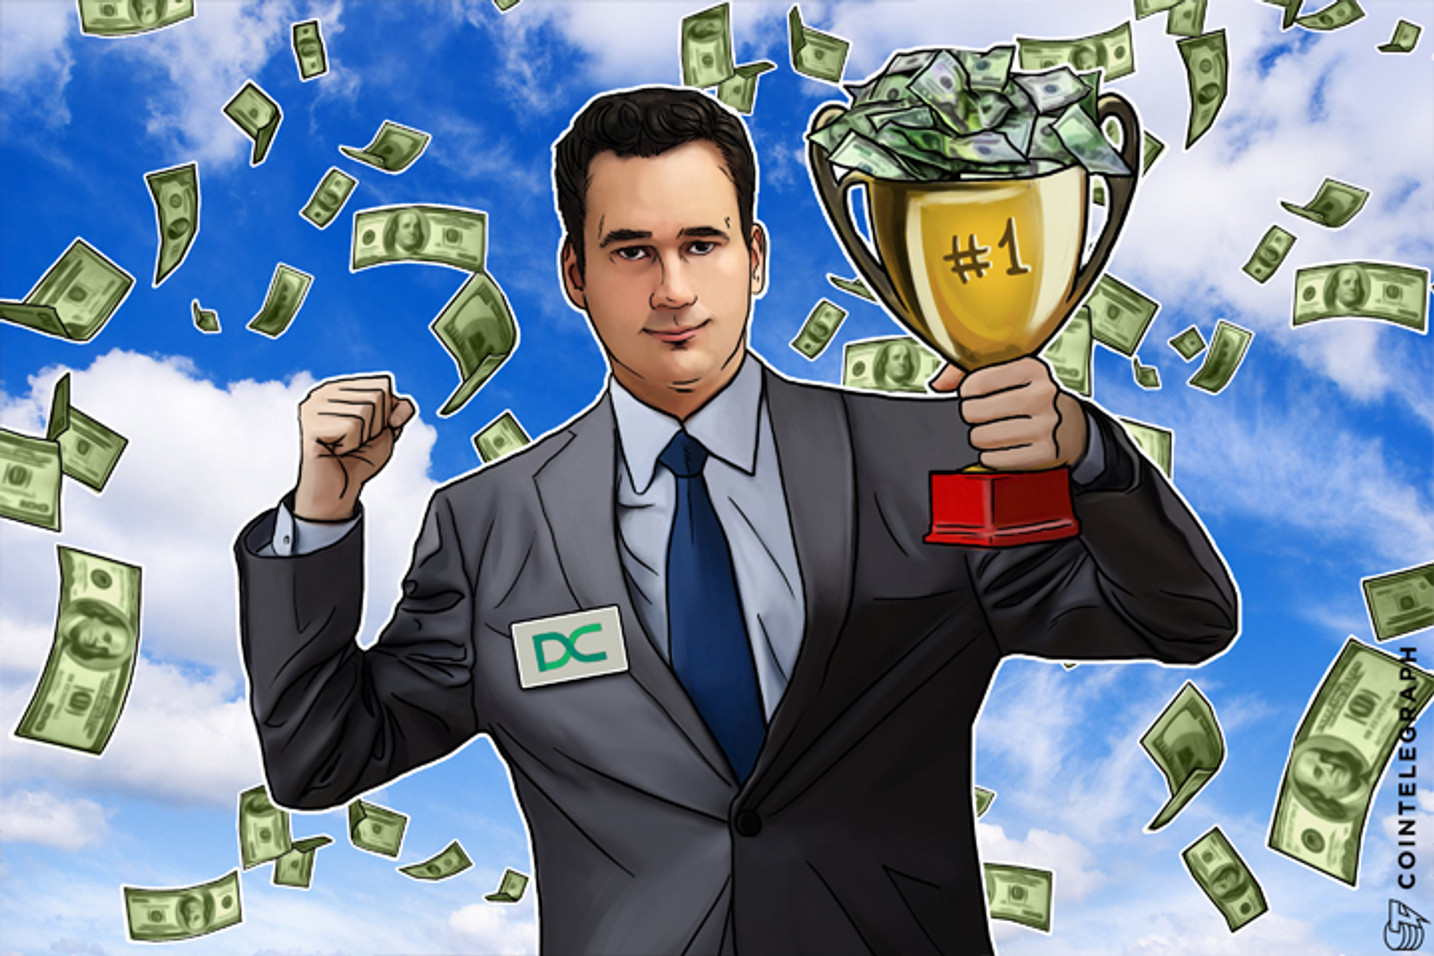 CEO of Decent: We Raised Over 5500 BTC Half Way Into ICO